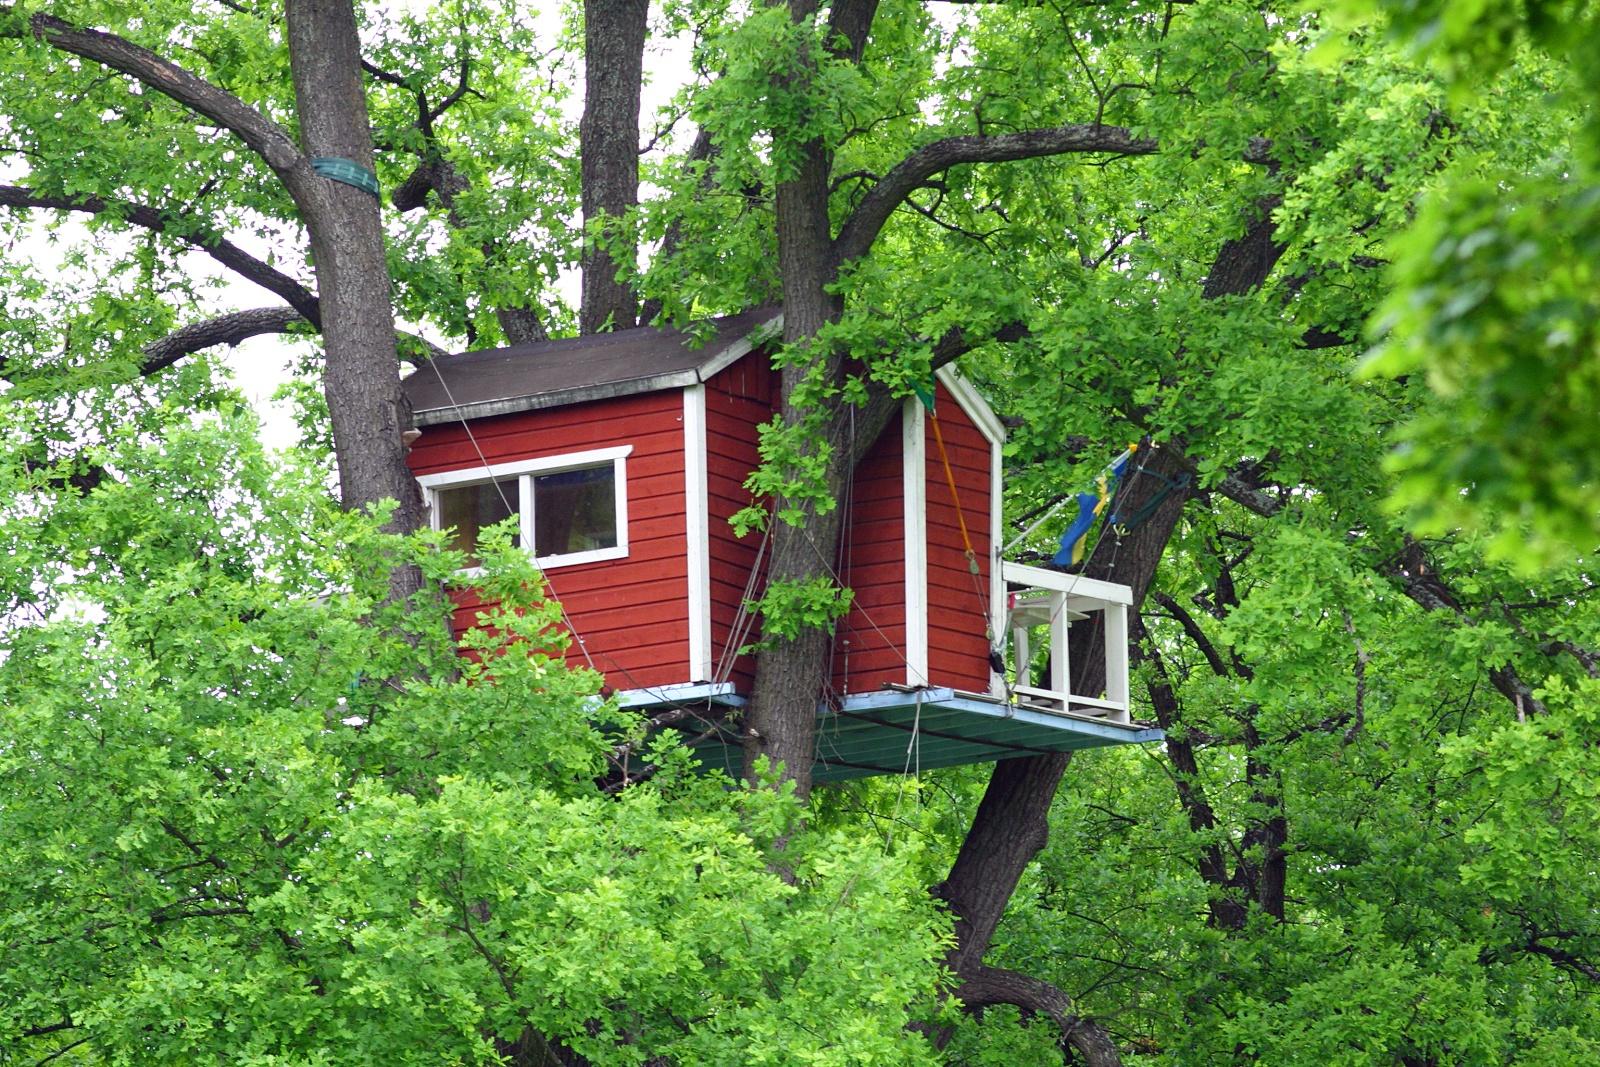 hotel-woodpecker-plus-petit-hotel-monde-nuit-insolite-0